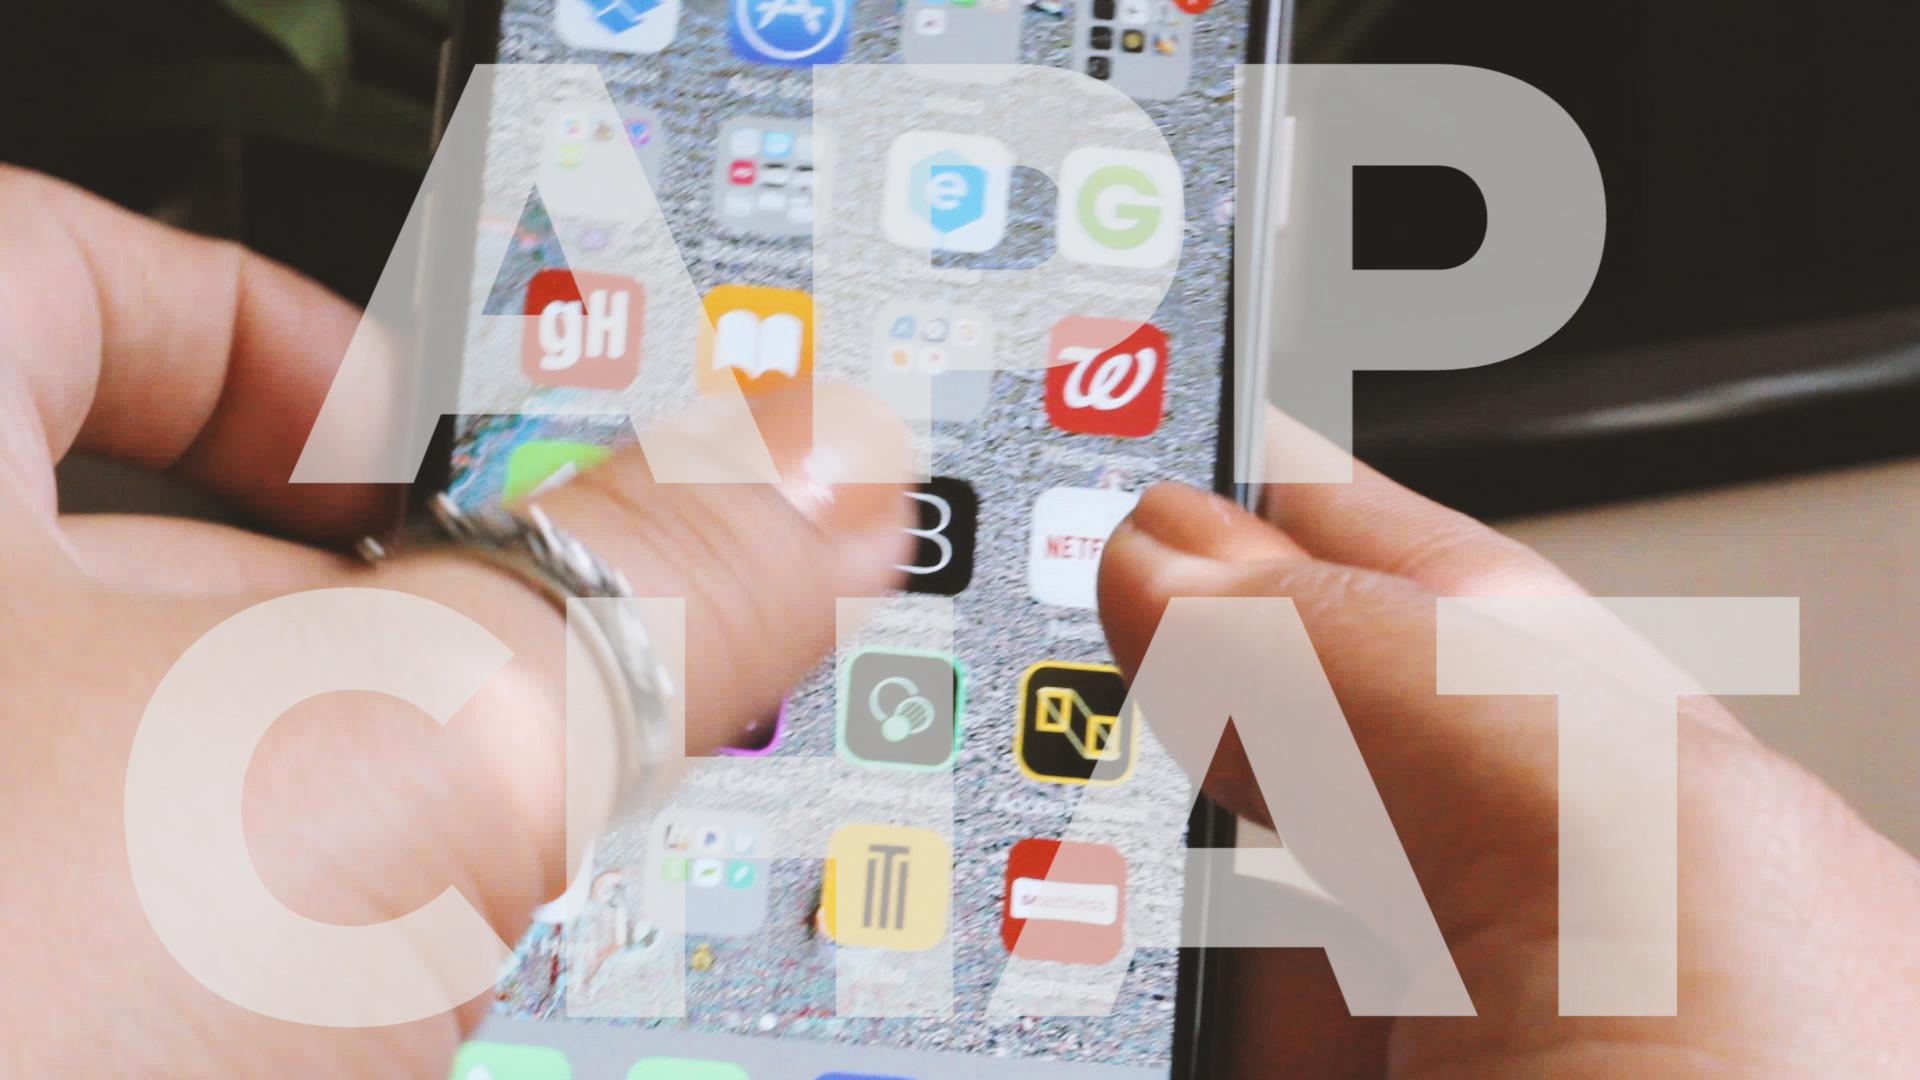 app-chat-screen.jpg